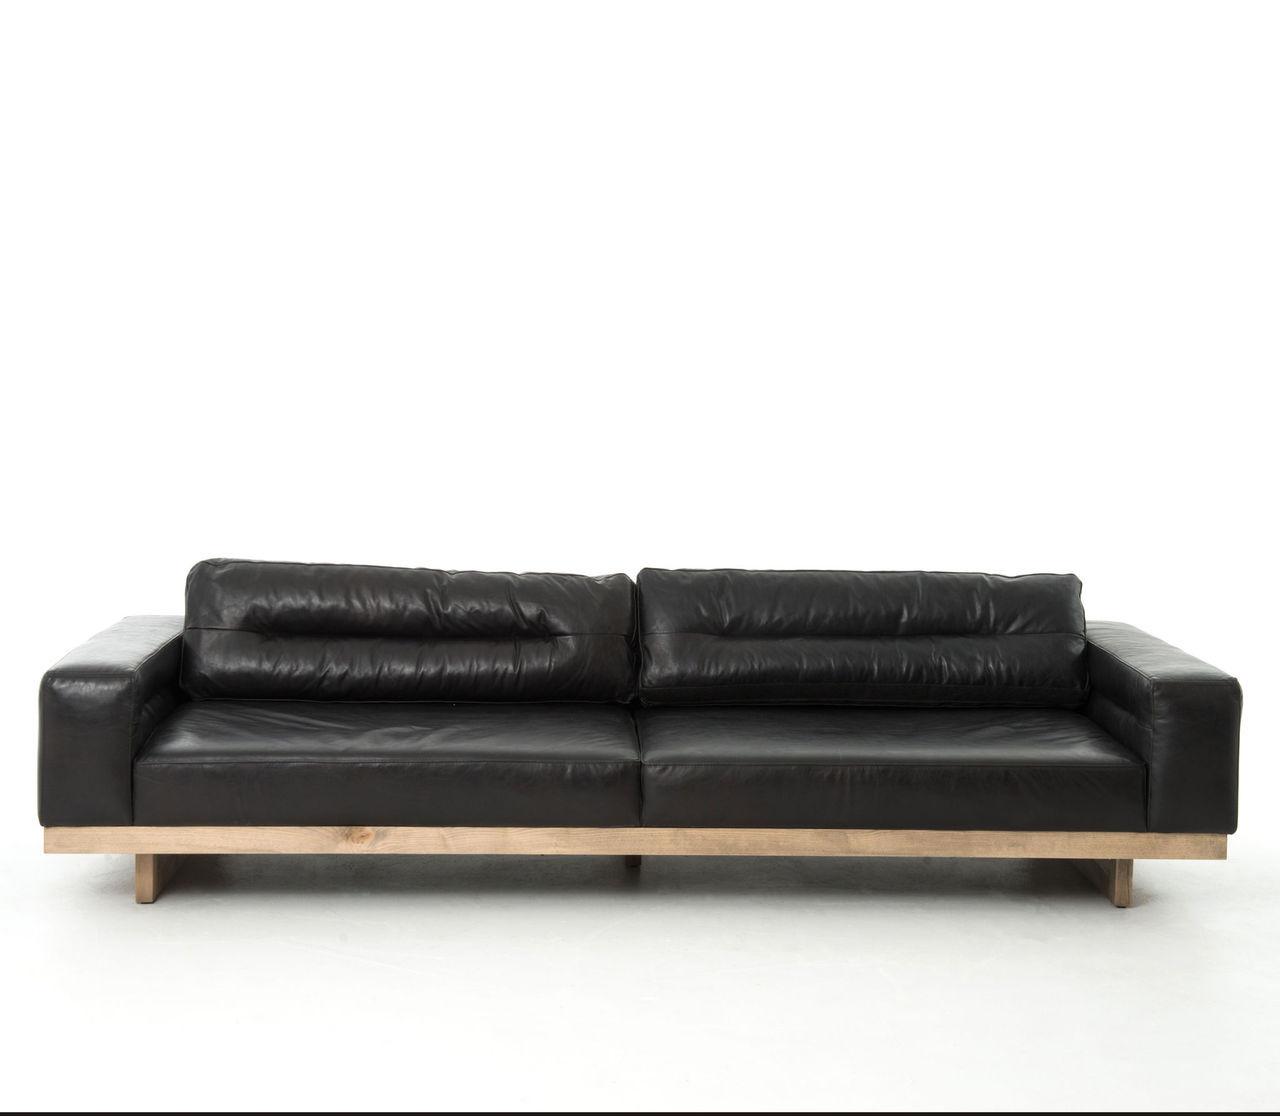 modern low back sofas lazy boy sofa sleeper mattress supplieranufacturers at thesofa